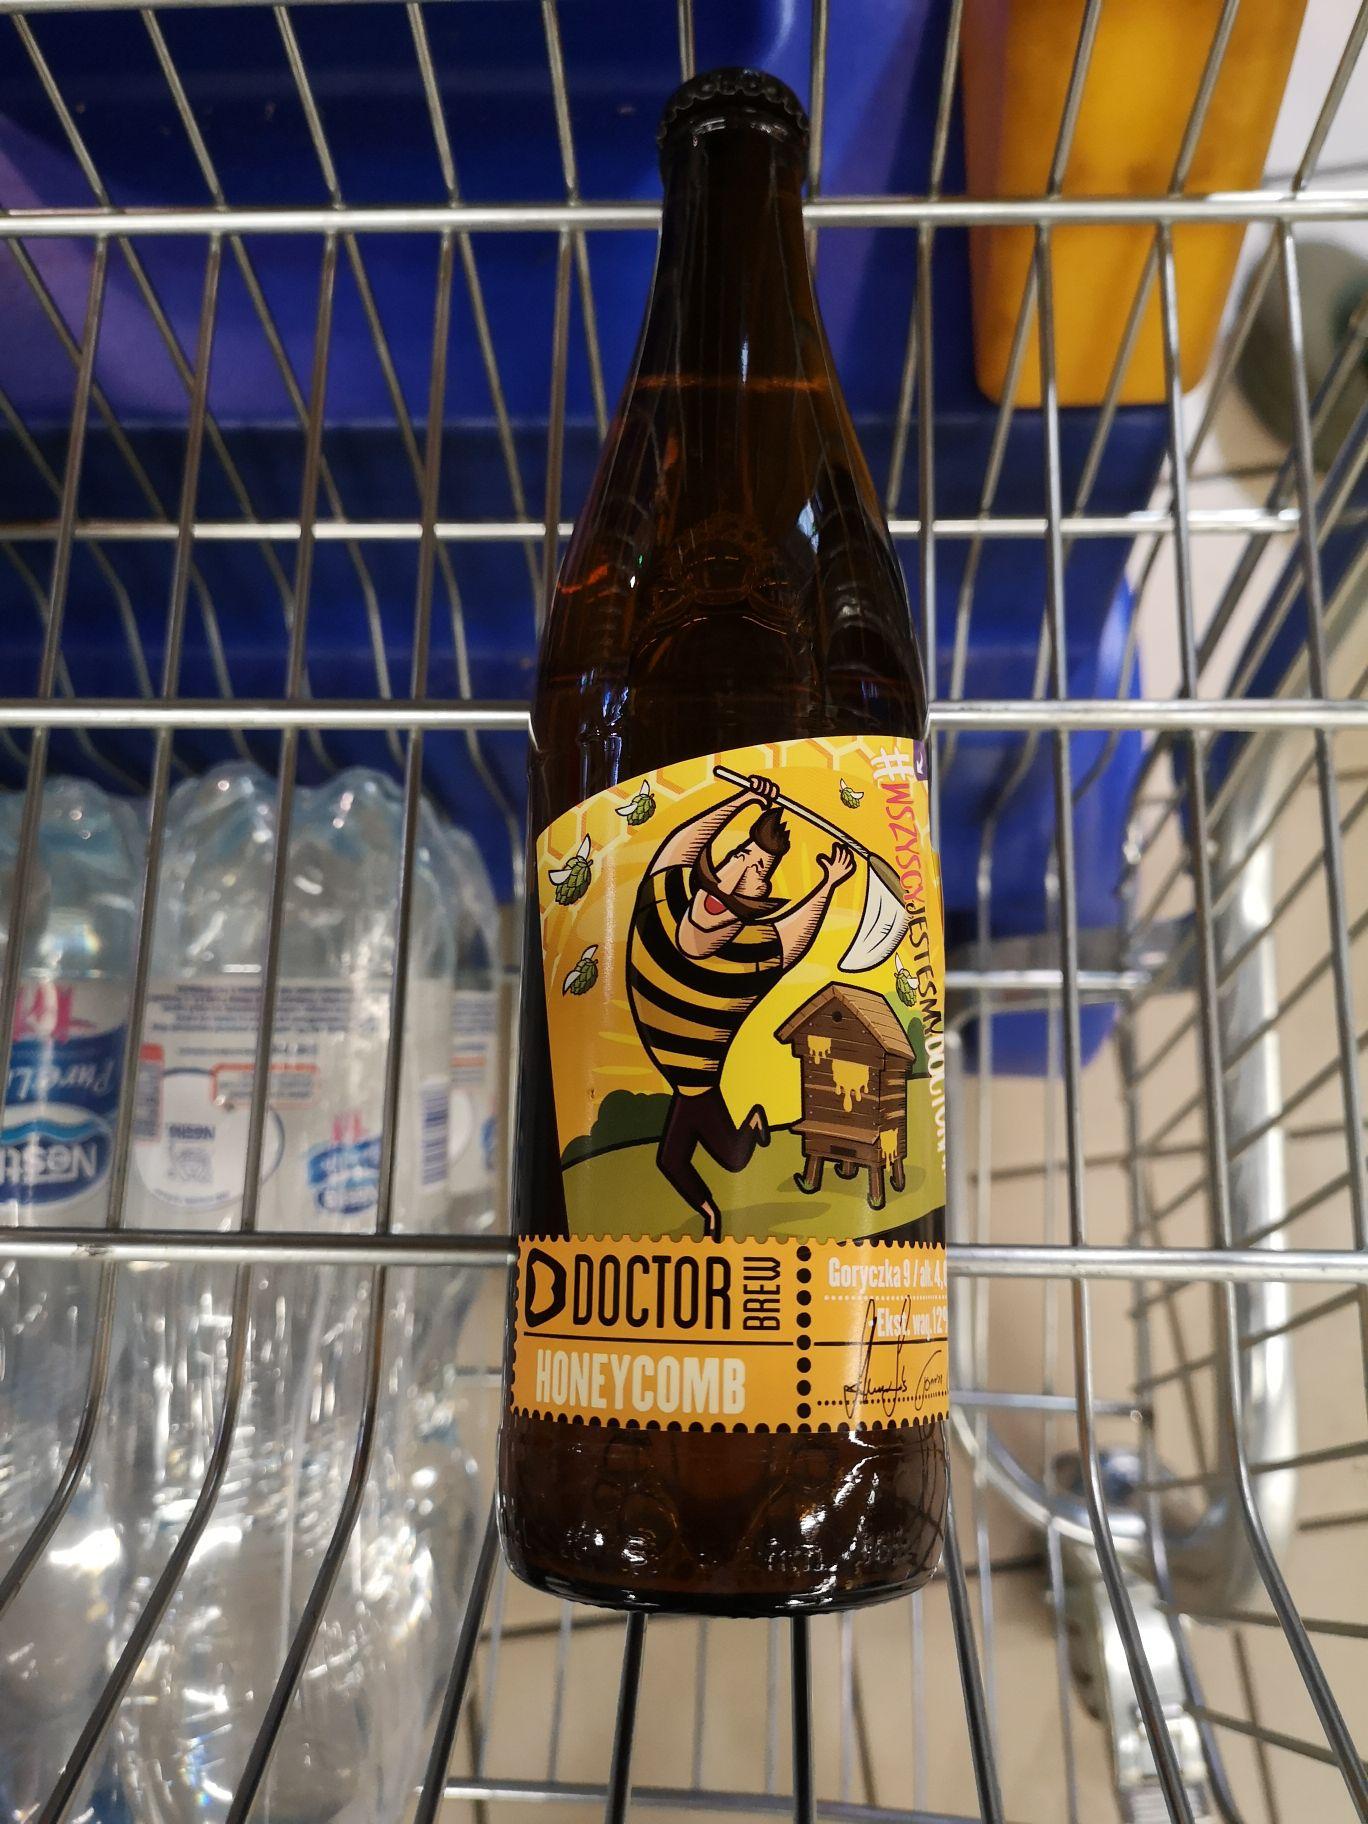 Piwo Doctor brew honeycomb Lublin eleclerc